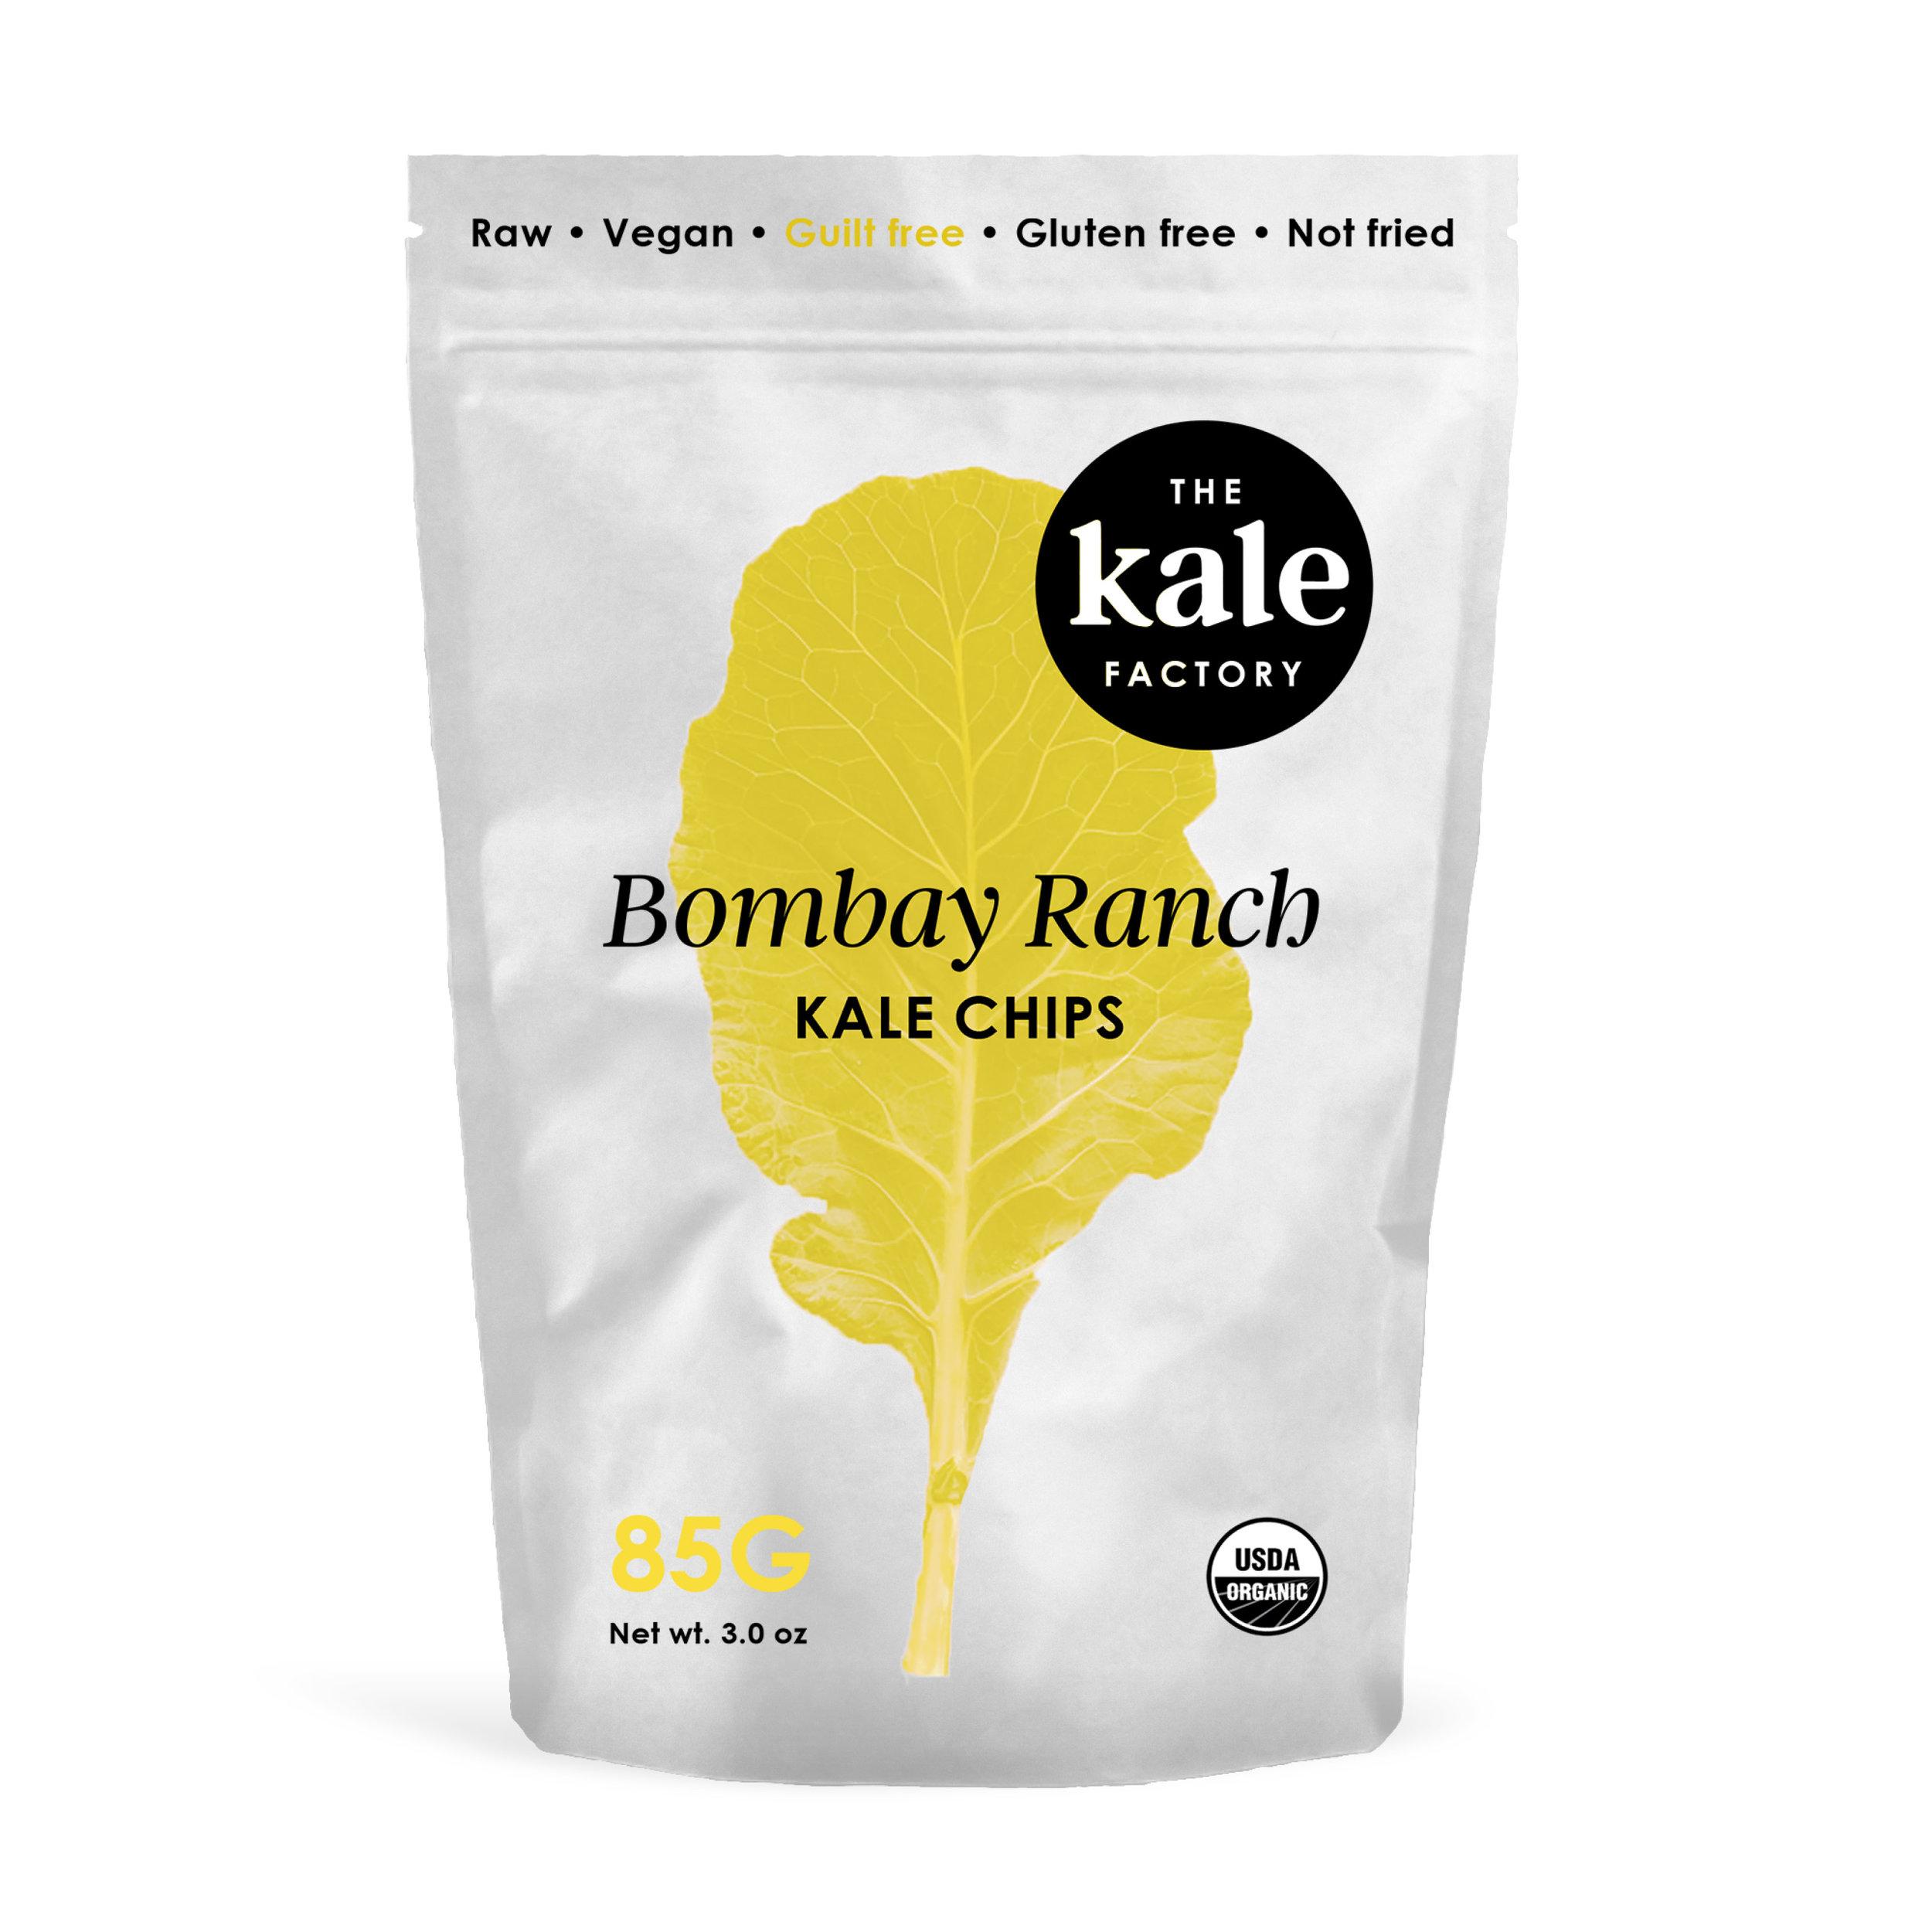 Kale-Packaging-Front-BombayRanch.jpg